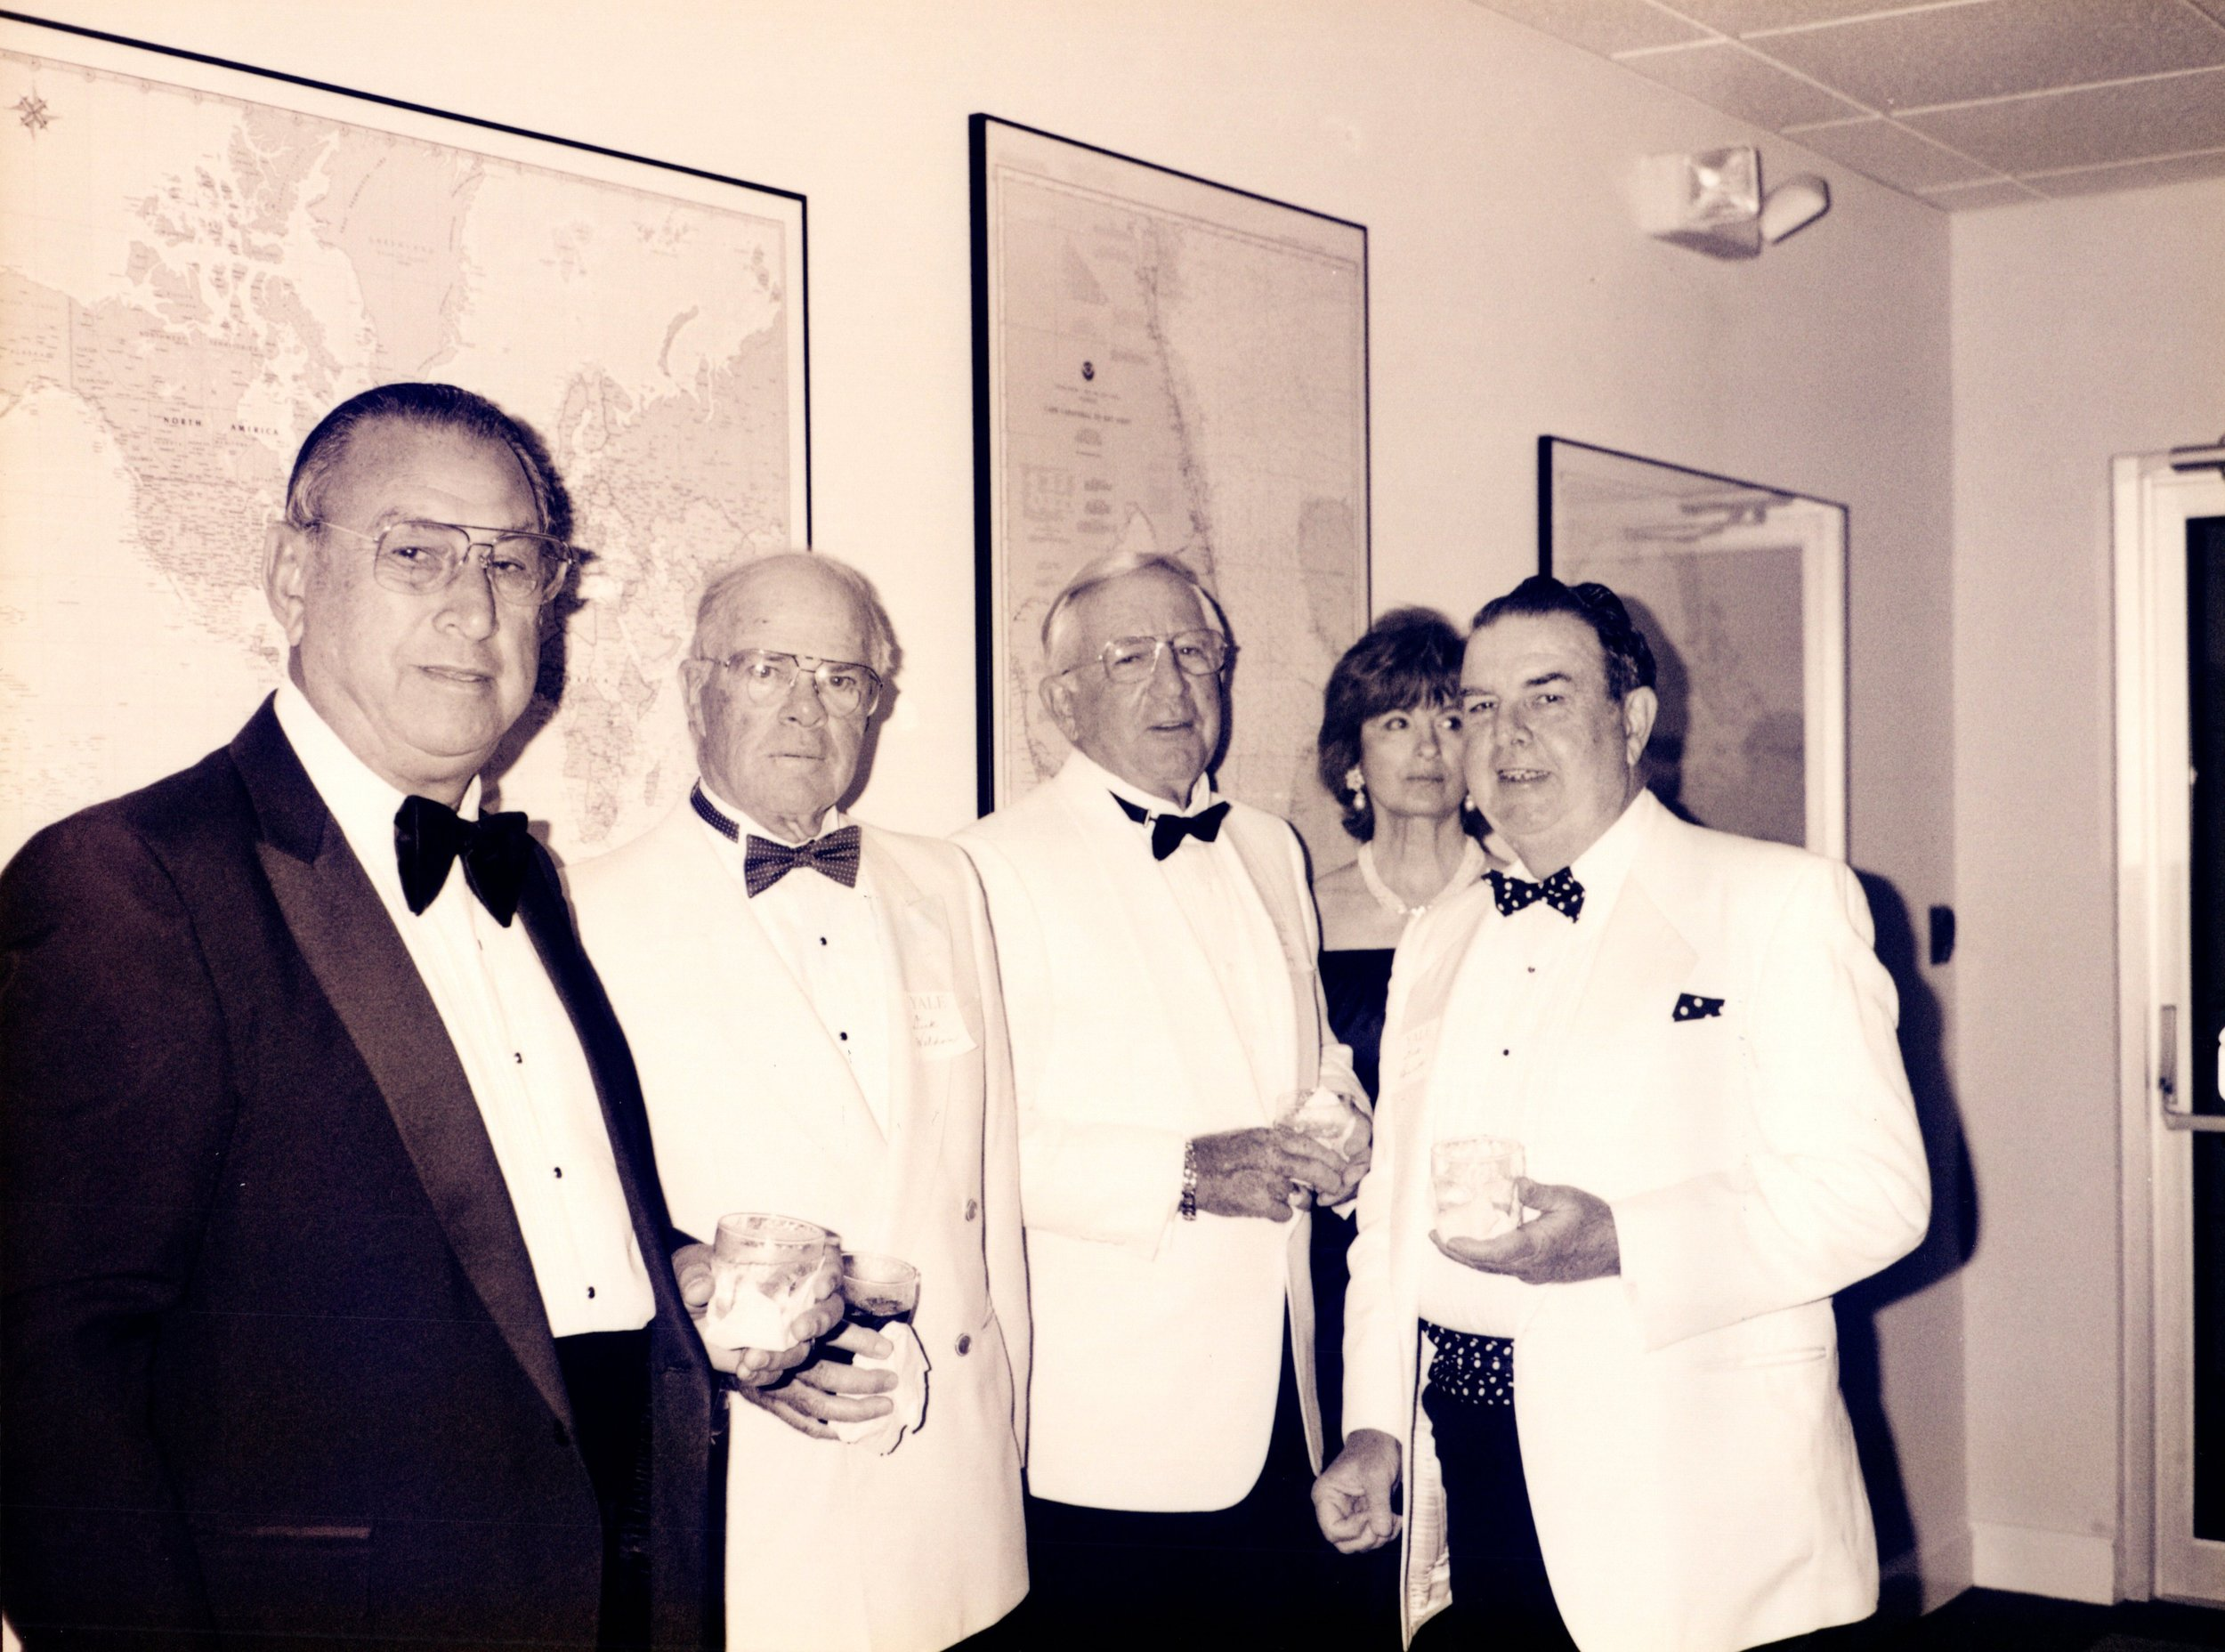 ARNOLD GARFINKEL '62MA, DICK BENNETT '52, TOM JONES '40